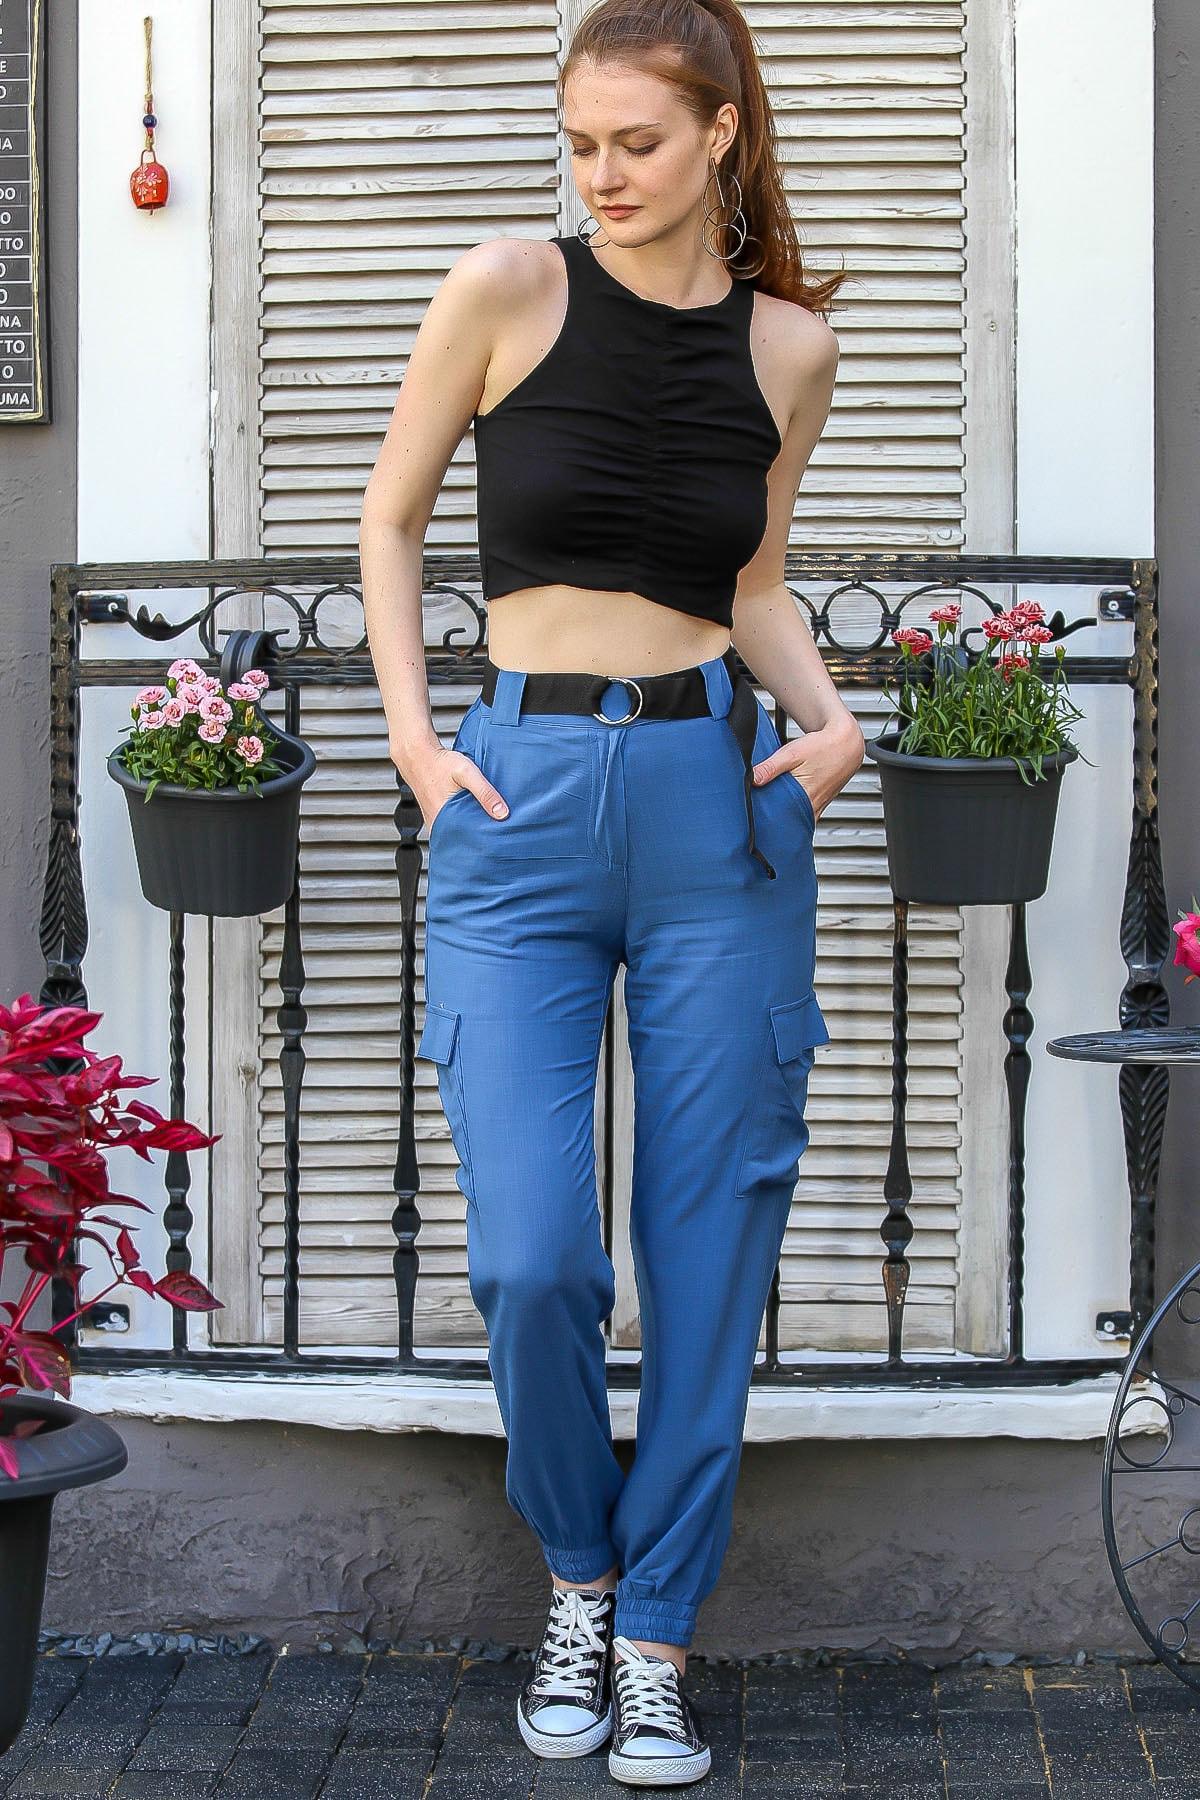 Chiccy Kadın Mavi Kemerli Kargo Cepli Paçası Lastikli Dokuma Pantolon M10060000Pn98777